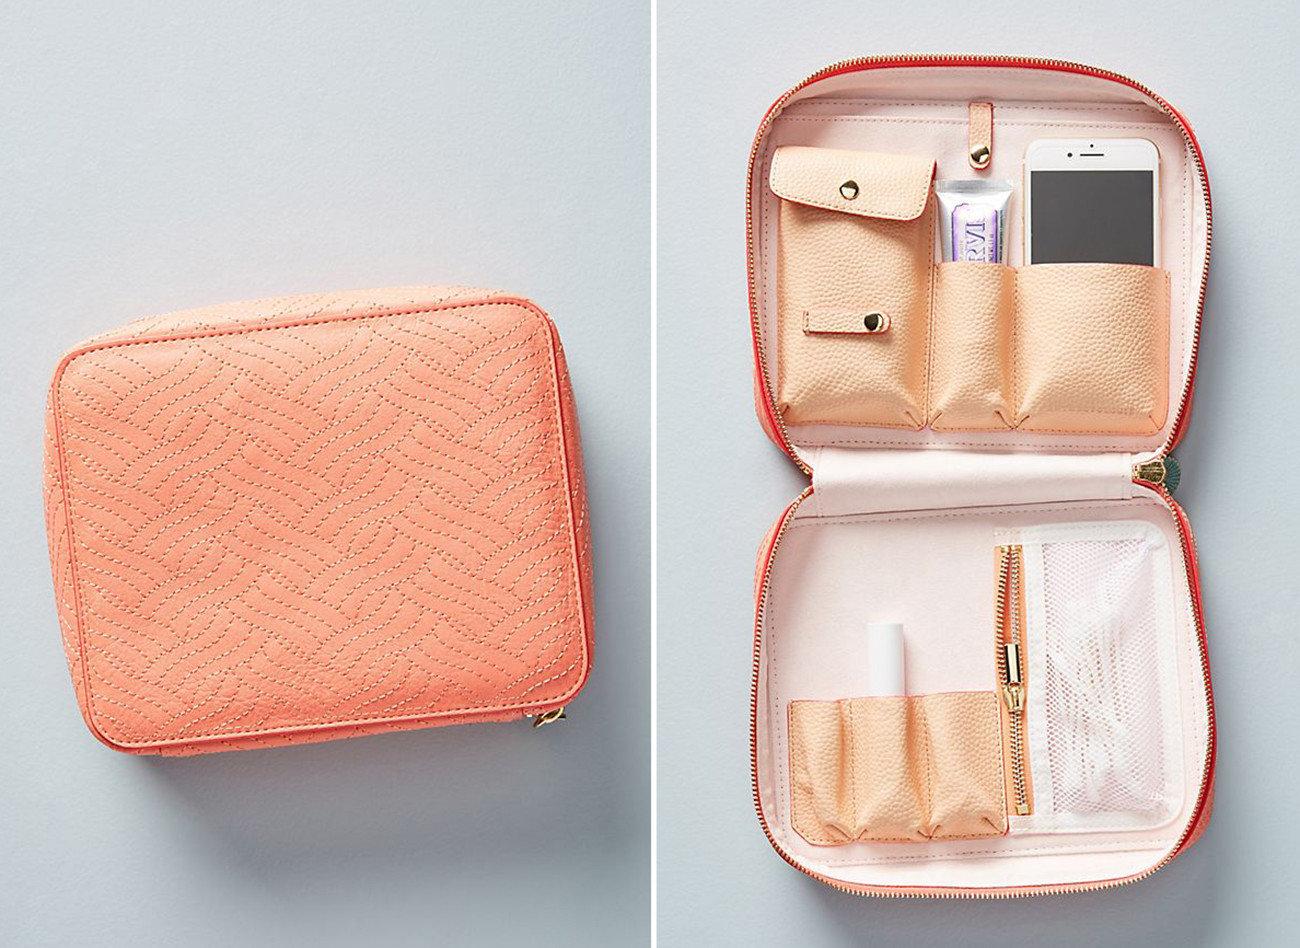 Travel Shop Travel Tech accessory fashion accessory case bag product product design coin purse handbag box items leather peach